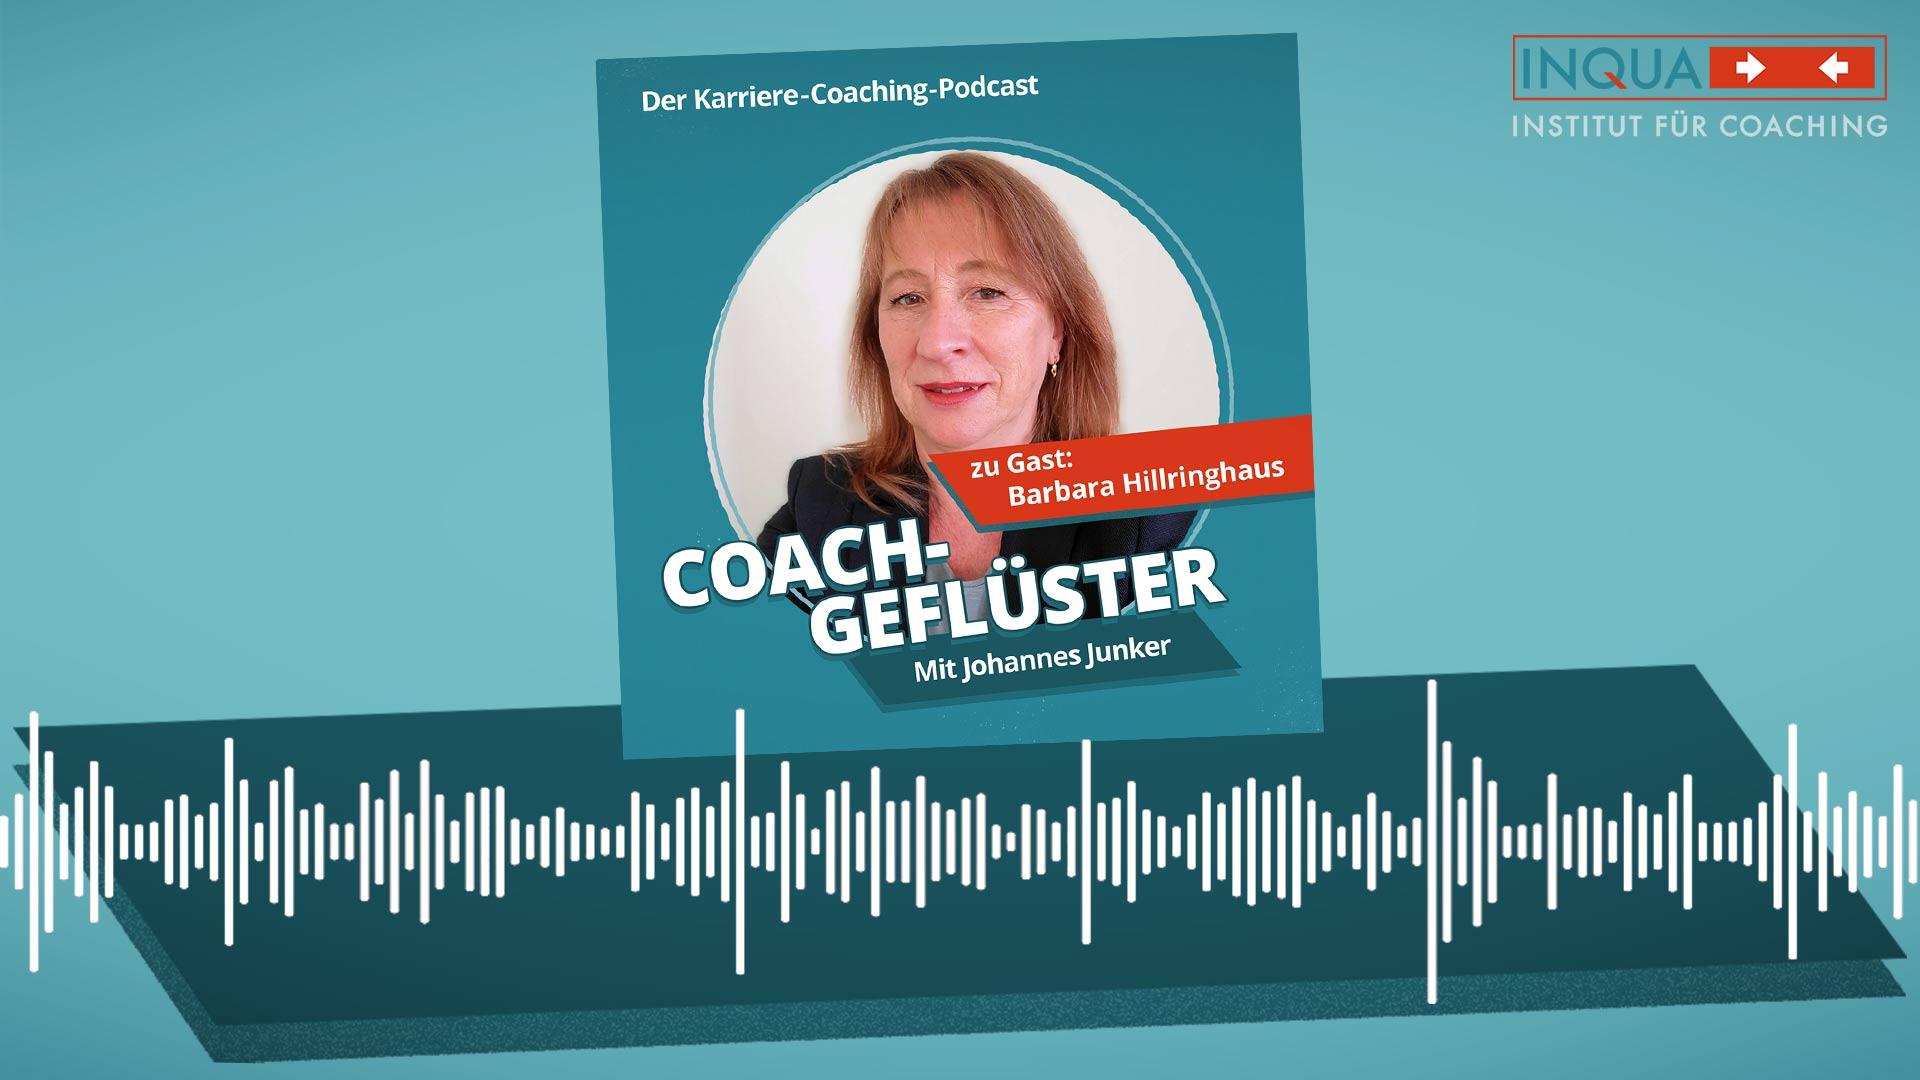 Podcast-Cover COACHGEFLÜSTER – Folge 9 mit Barbara Hillringhaus